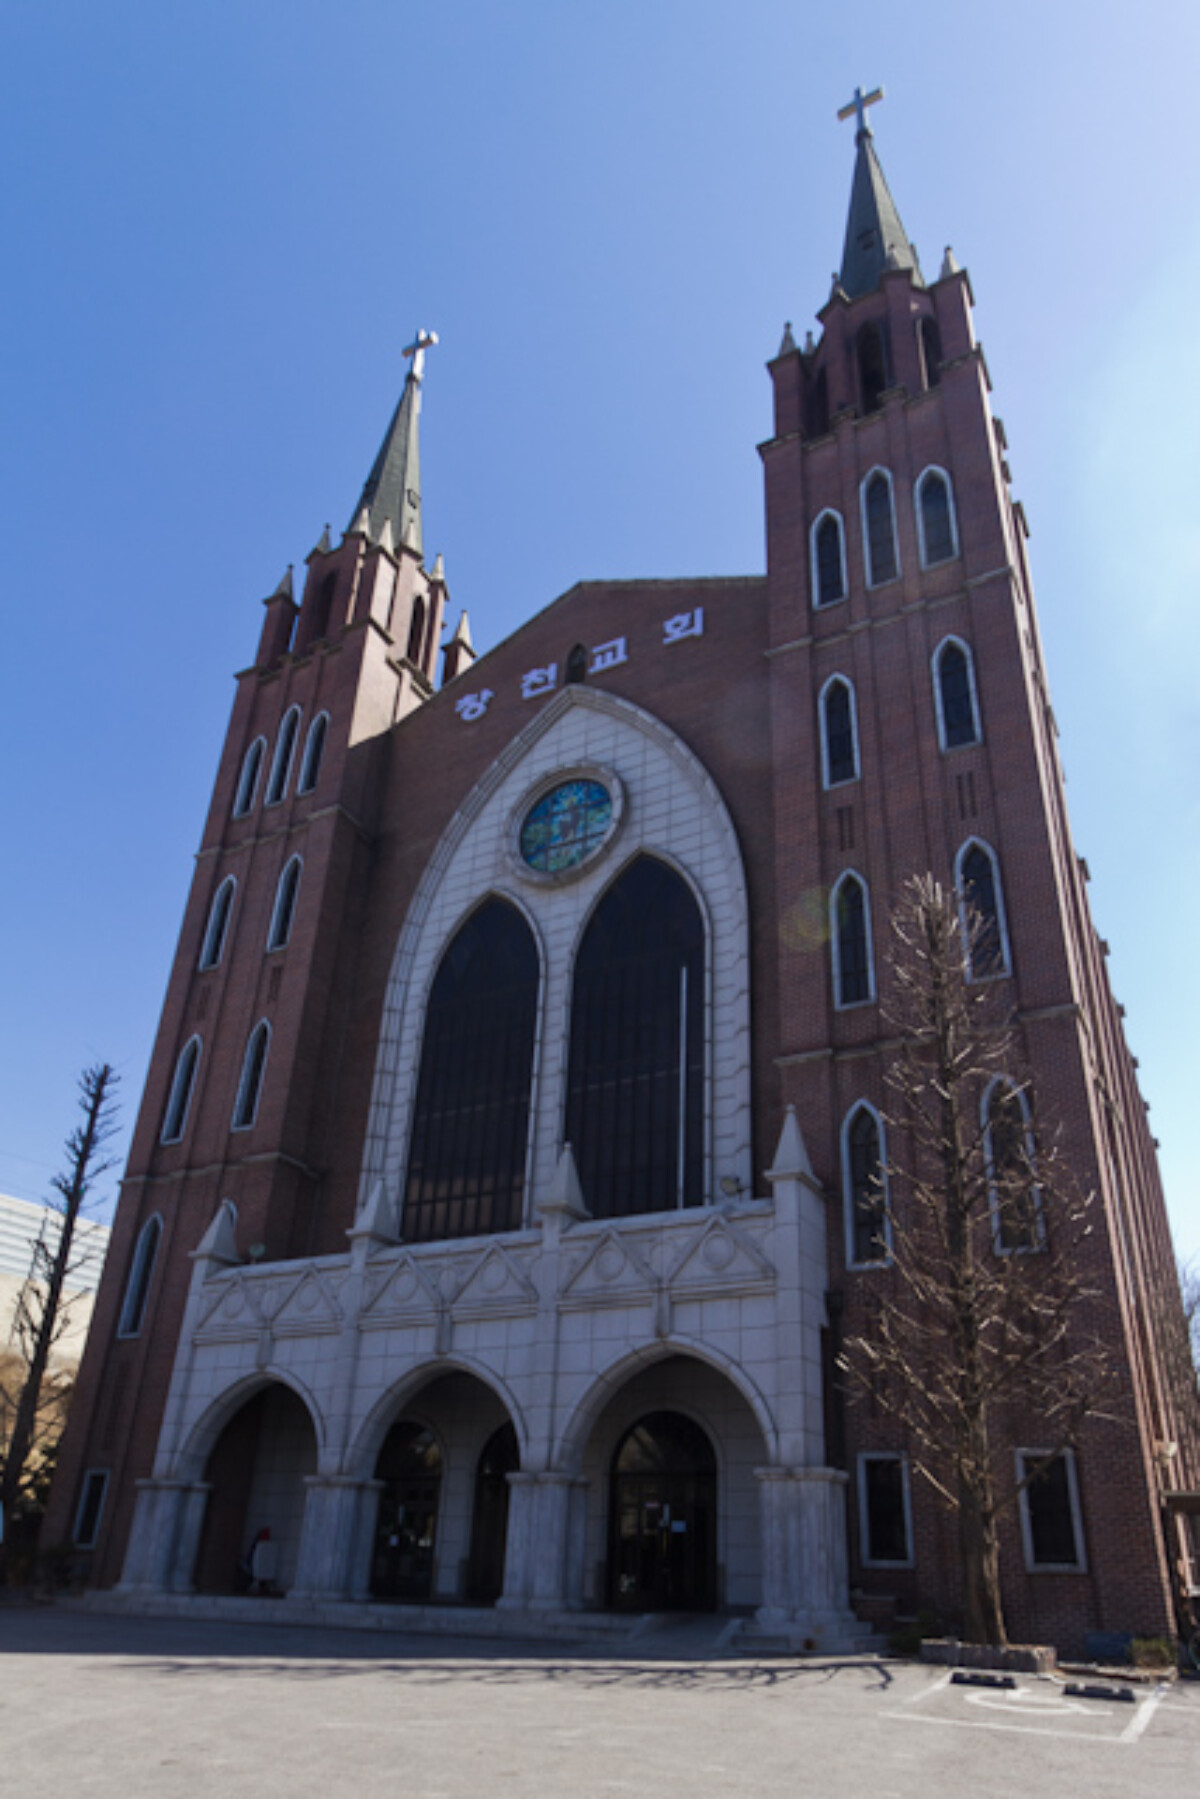 POTD day 84 Changchun church